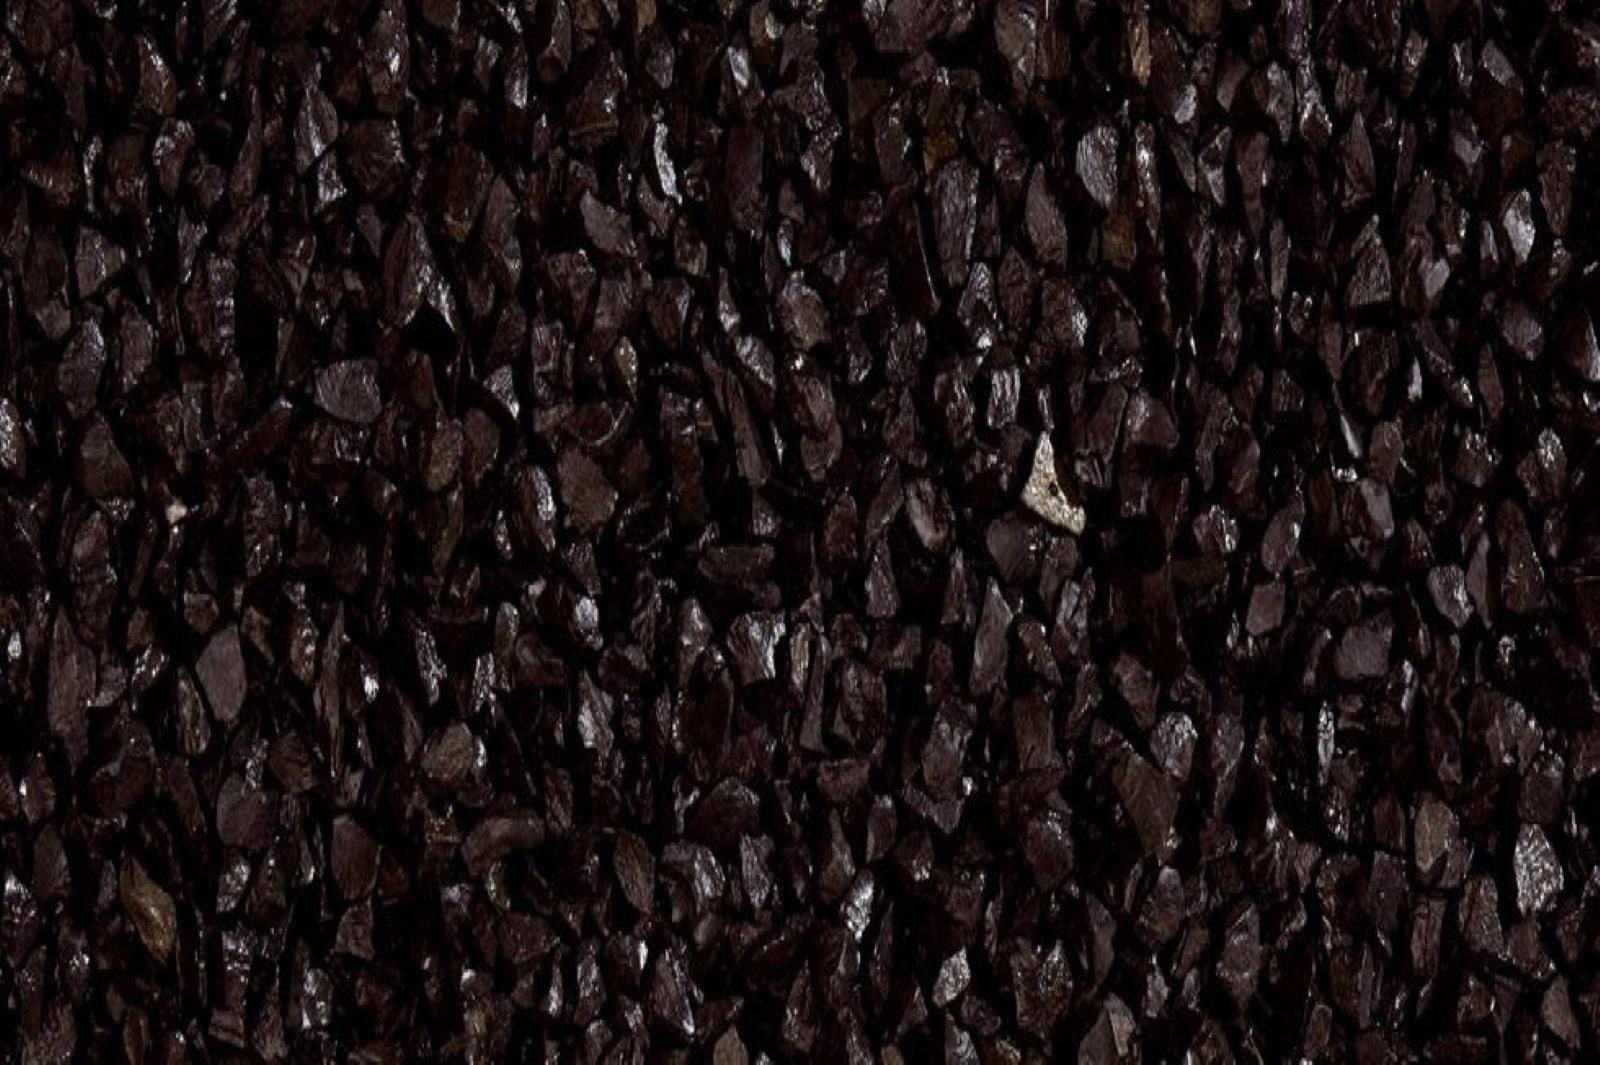 Gartensplitt Ziersplitt Nero Ebano Granulat Marmor schwarz 40 - 60 mm 25 kg